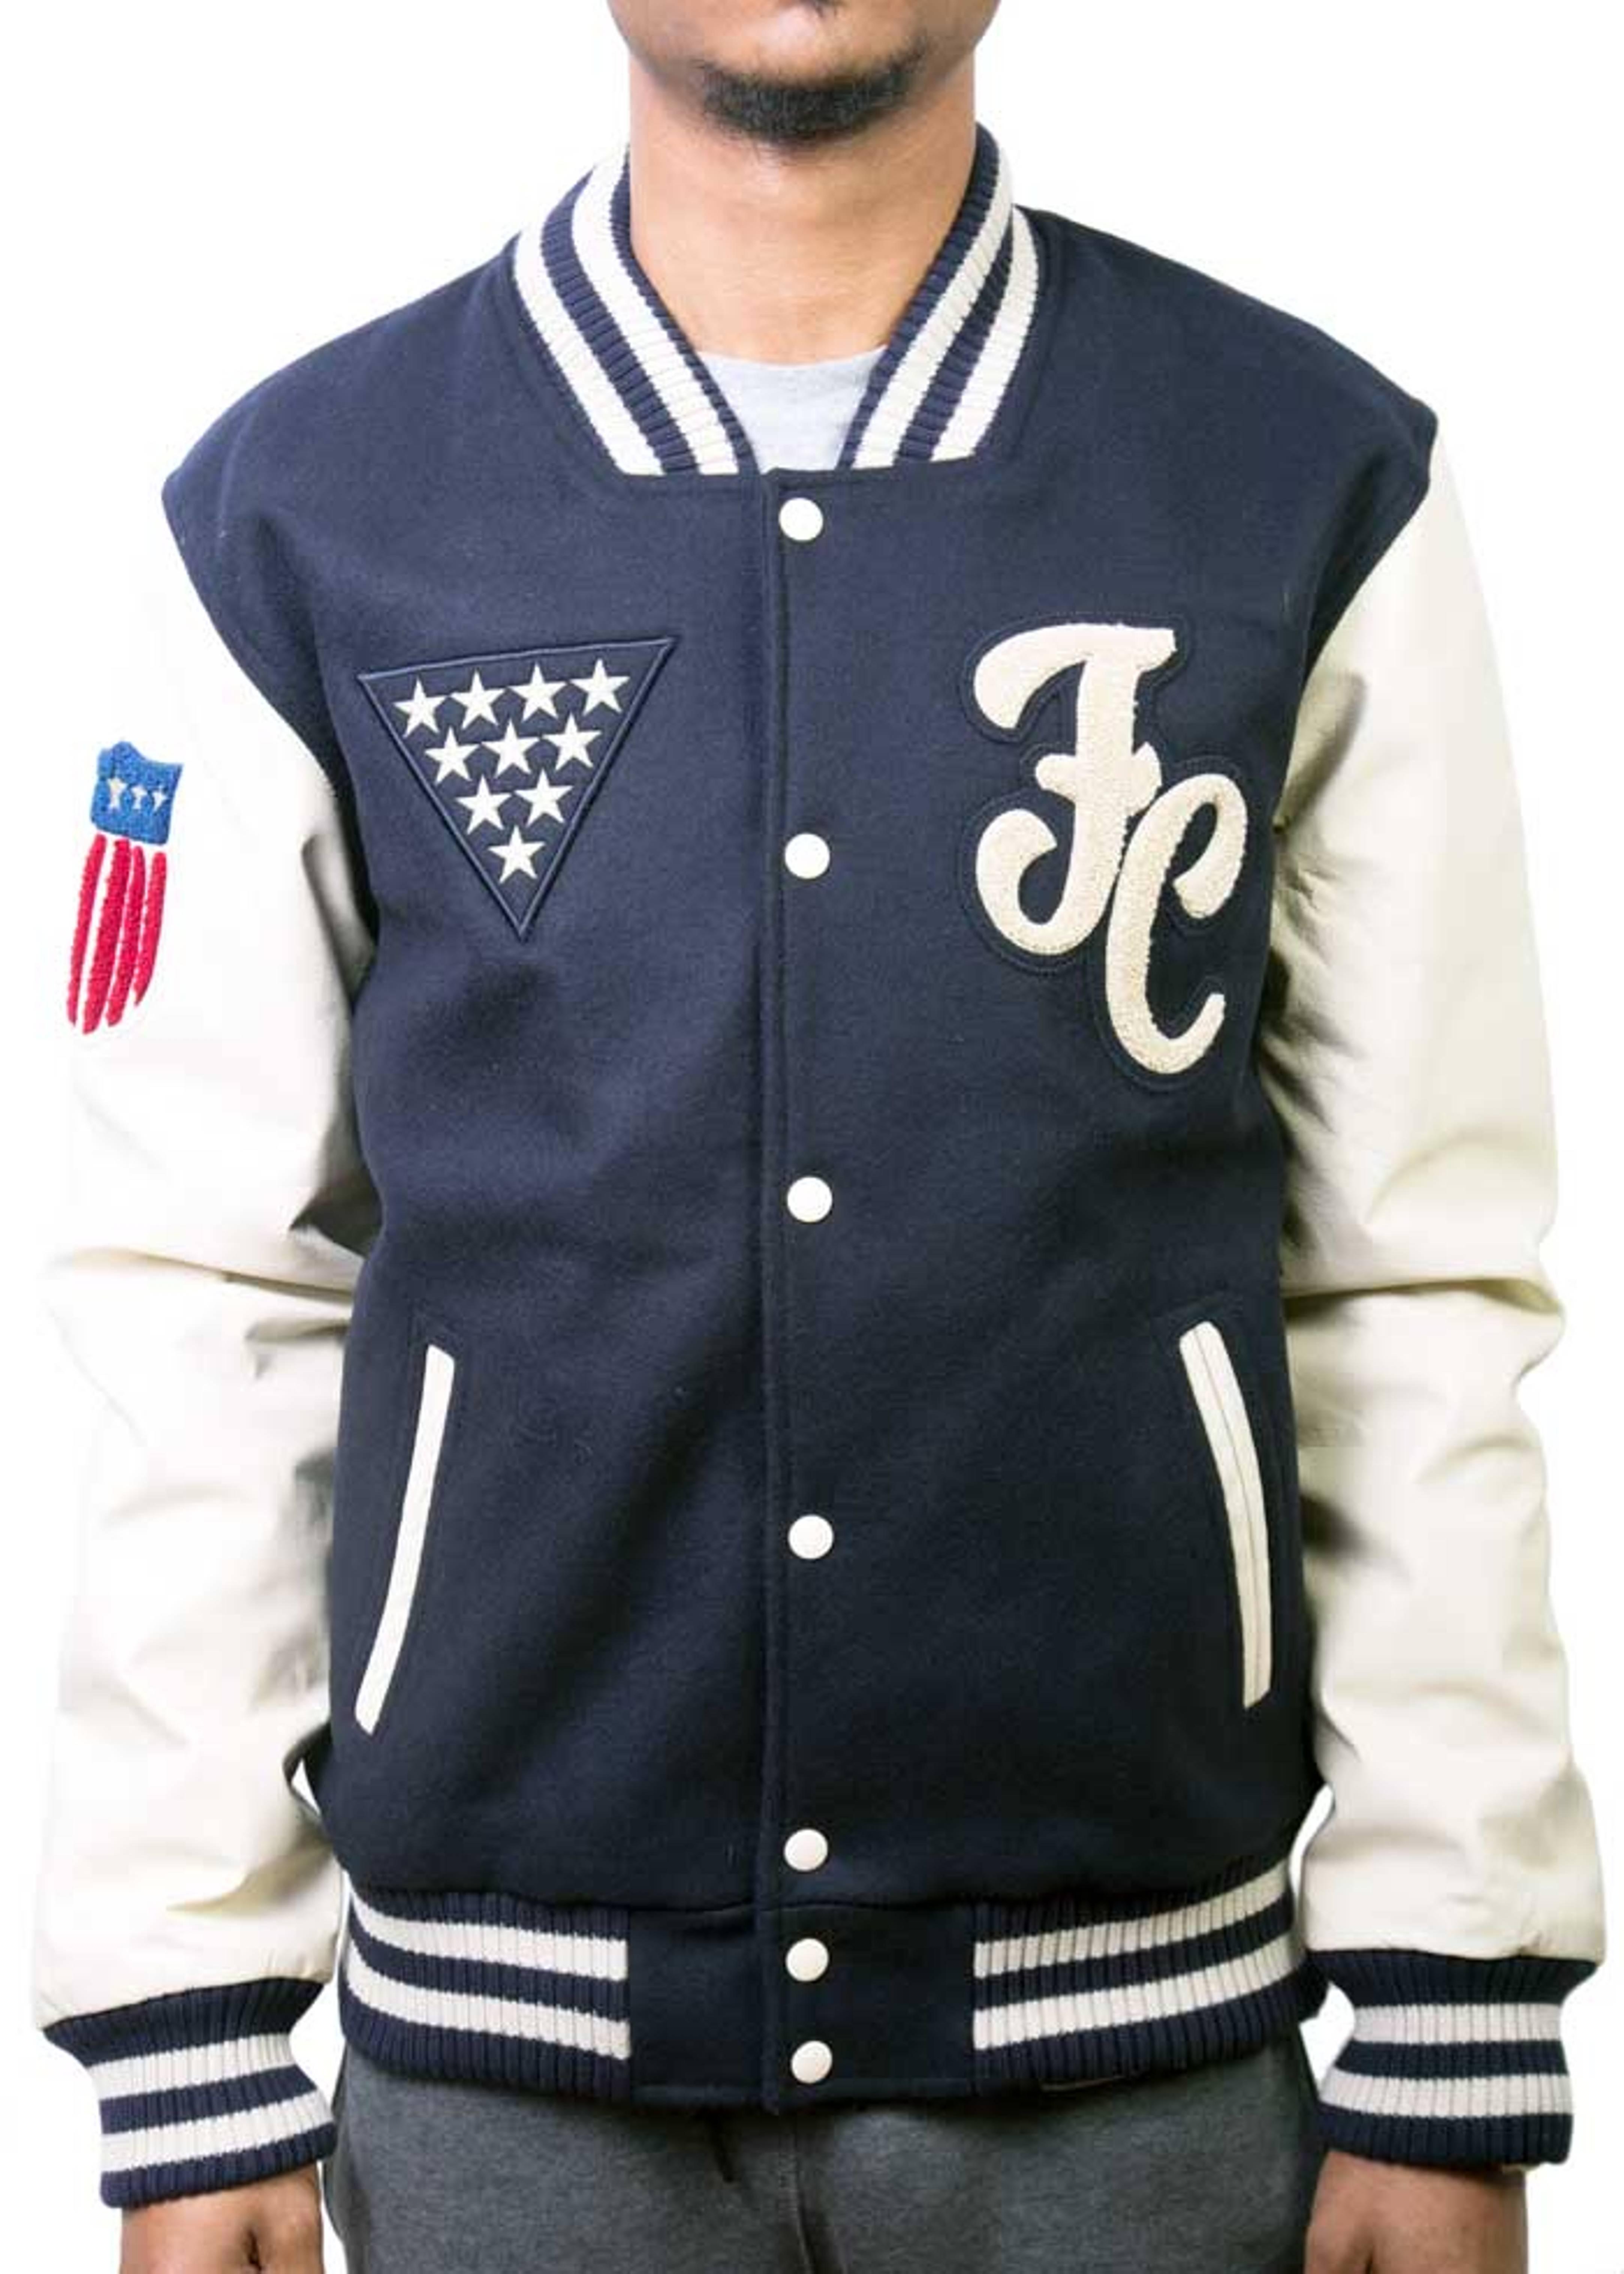 maverick varsity jacket